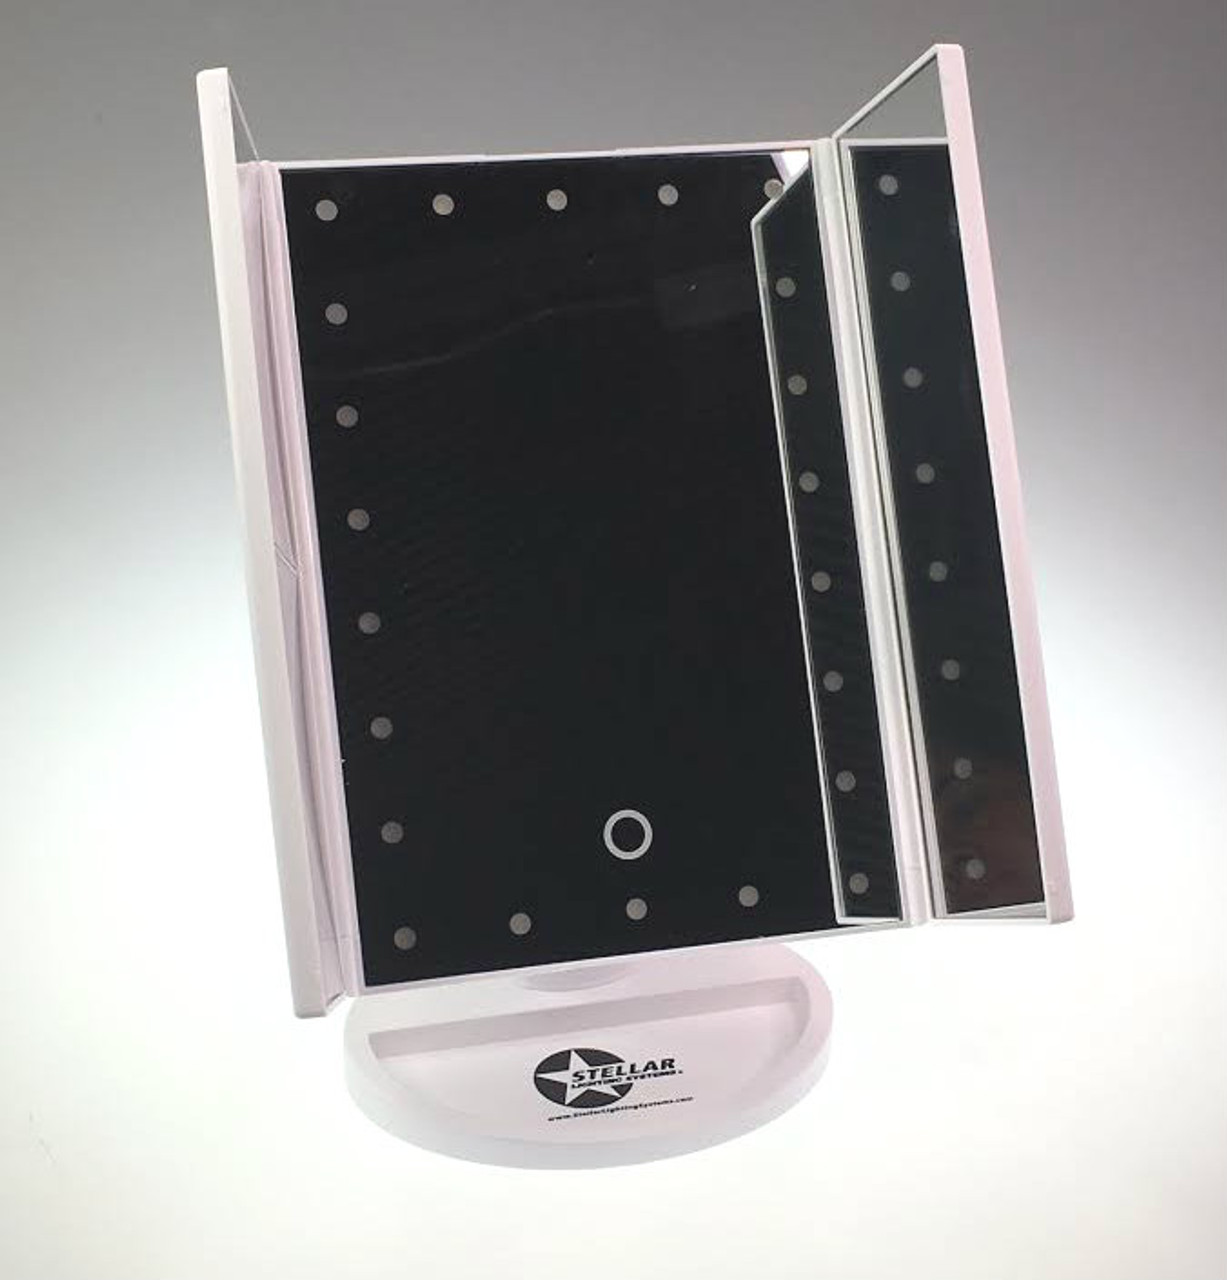 Stellar Vanity  Doble Mirror